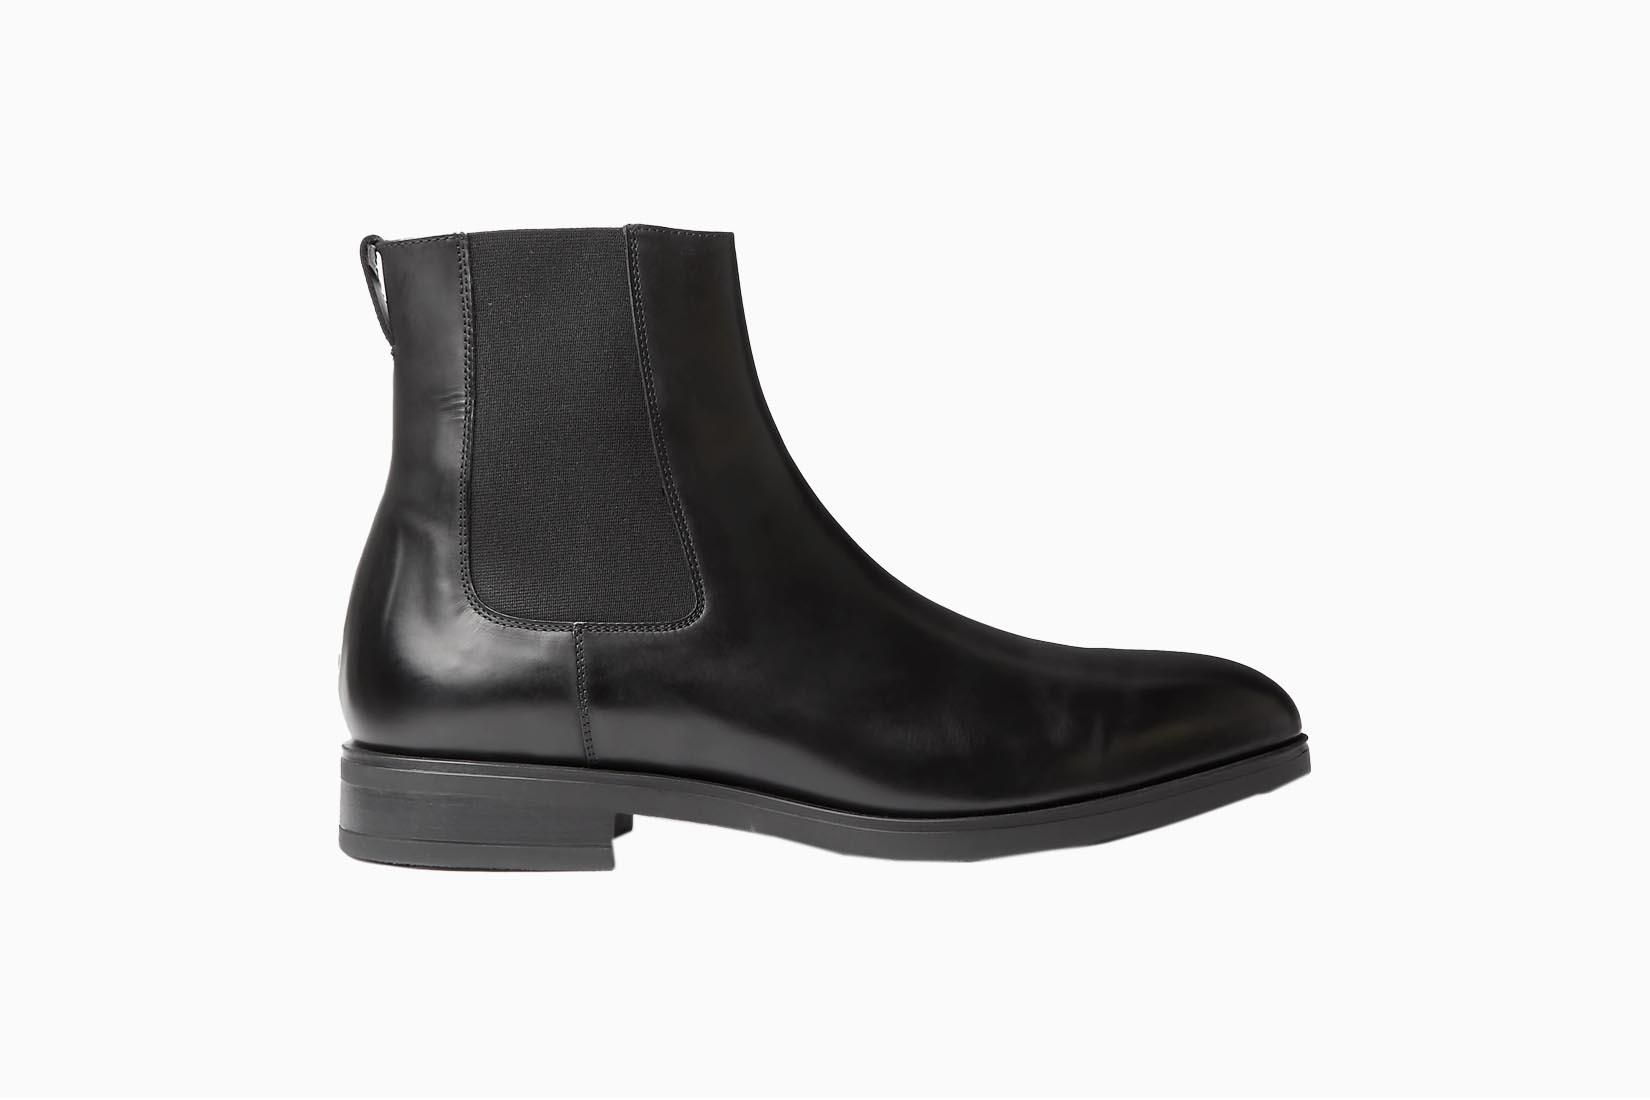 best boots men paul smith review Luxe Digital